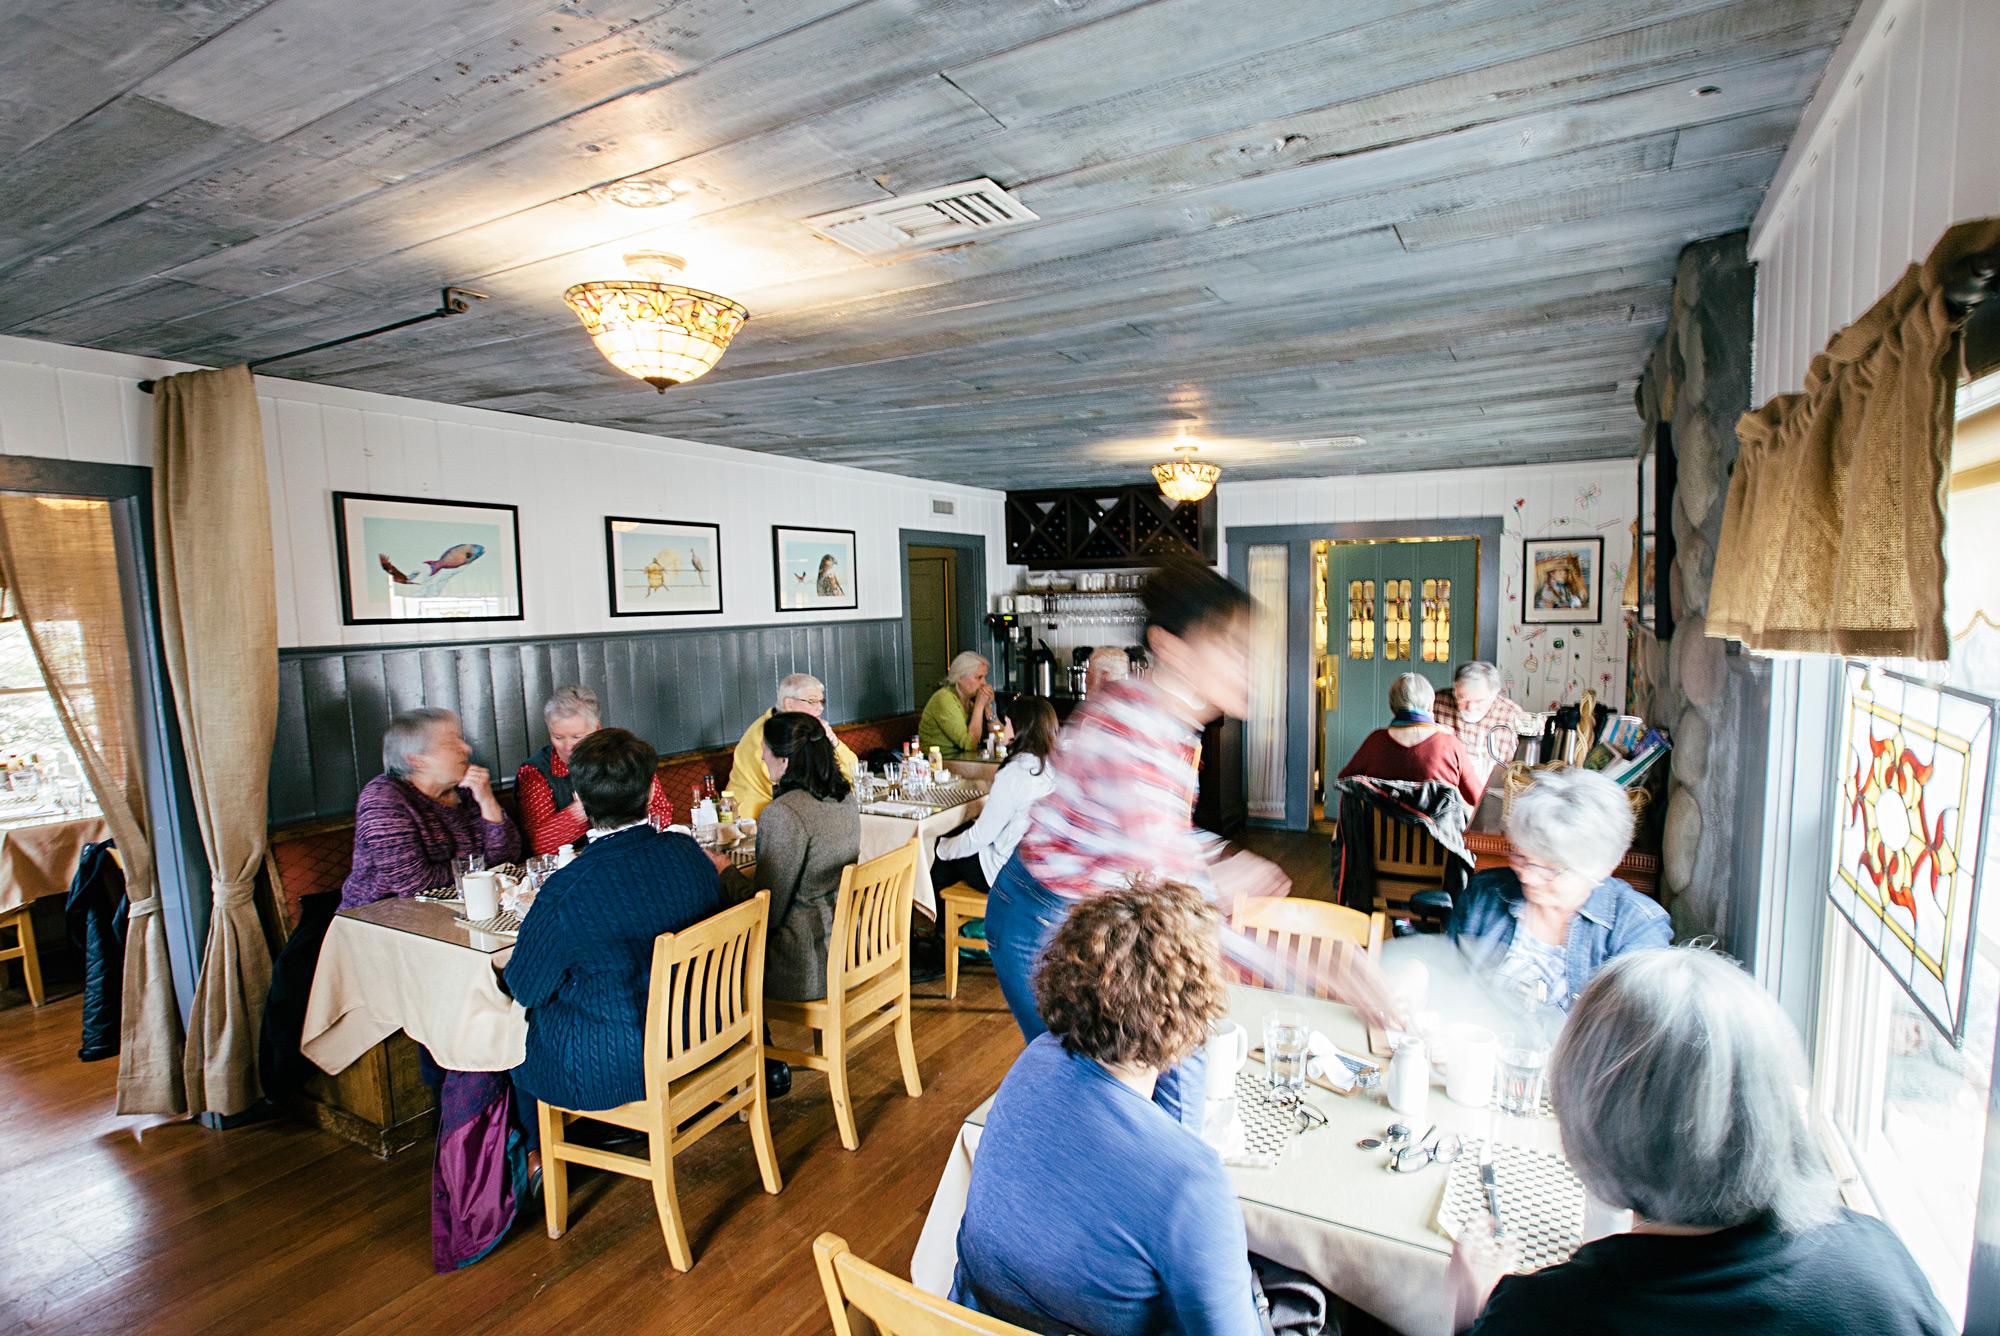 cottonwood-cafe-best-service-in-sisters-tripadvisor-top-rated.jpg